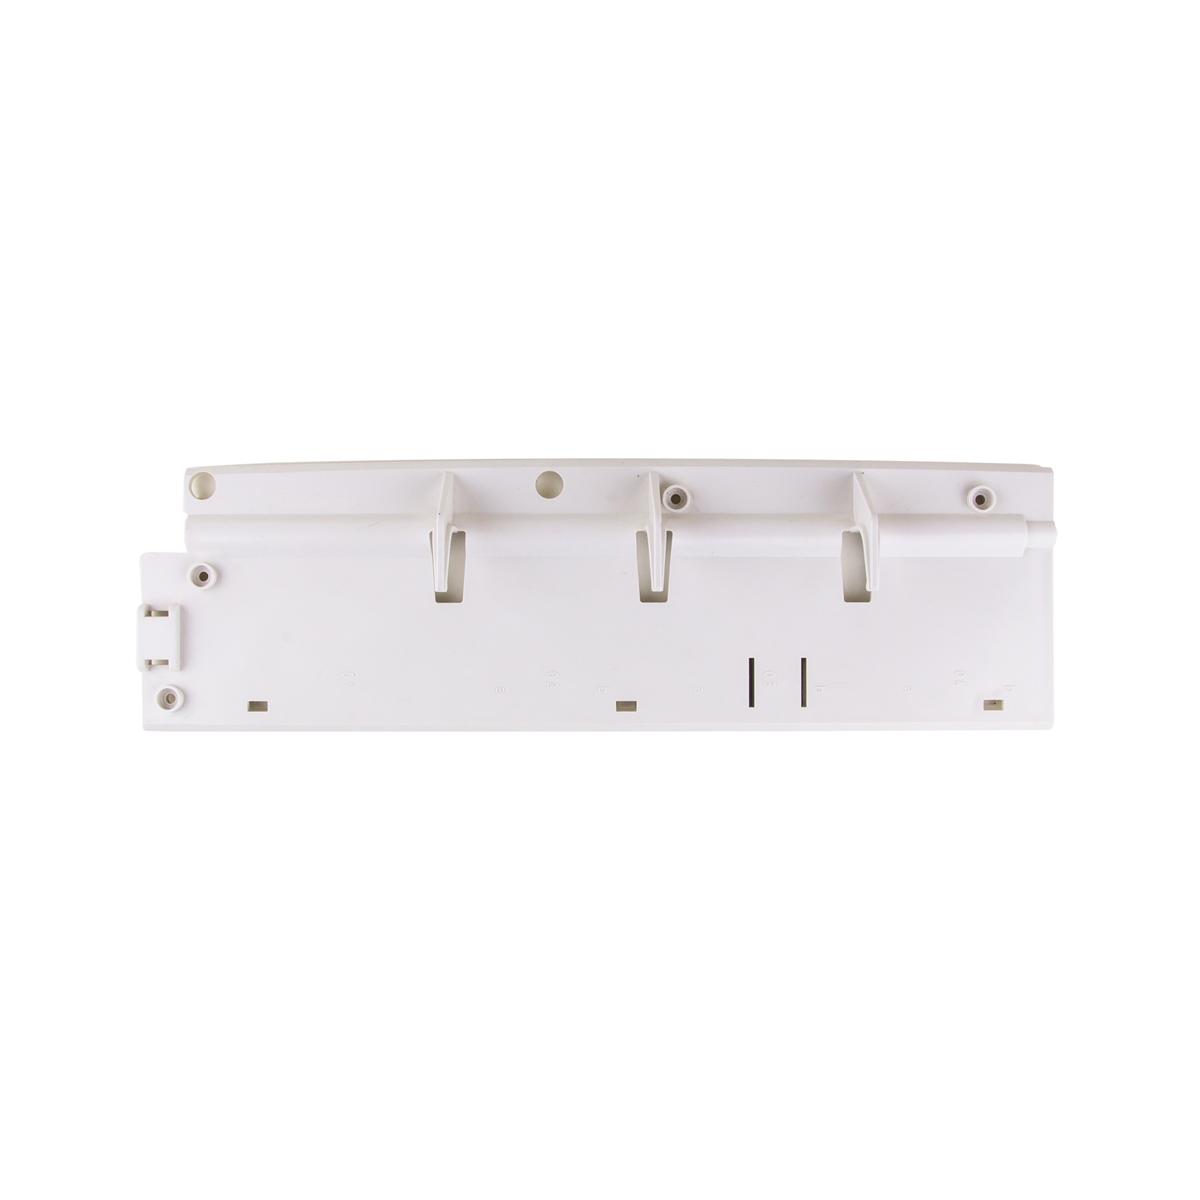 Philips IntelliVue MP60 MP70 Patient Monitor IO Circuit Board Plastic Holder Bracket